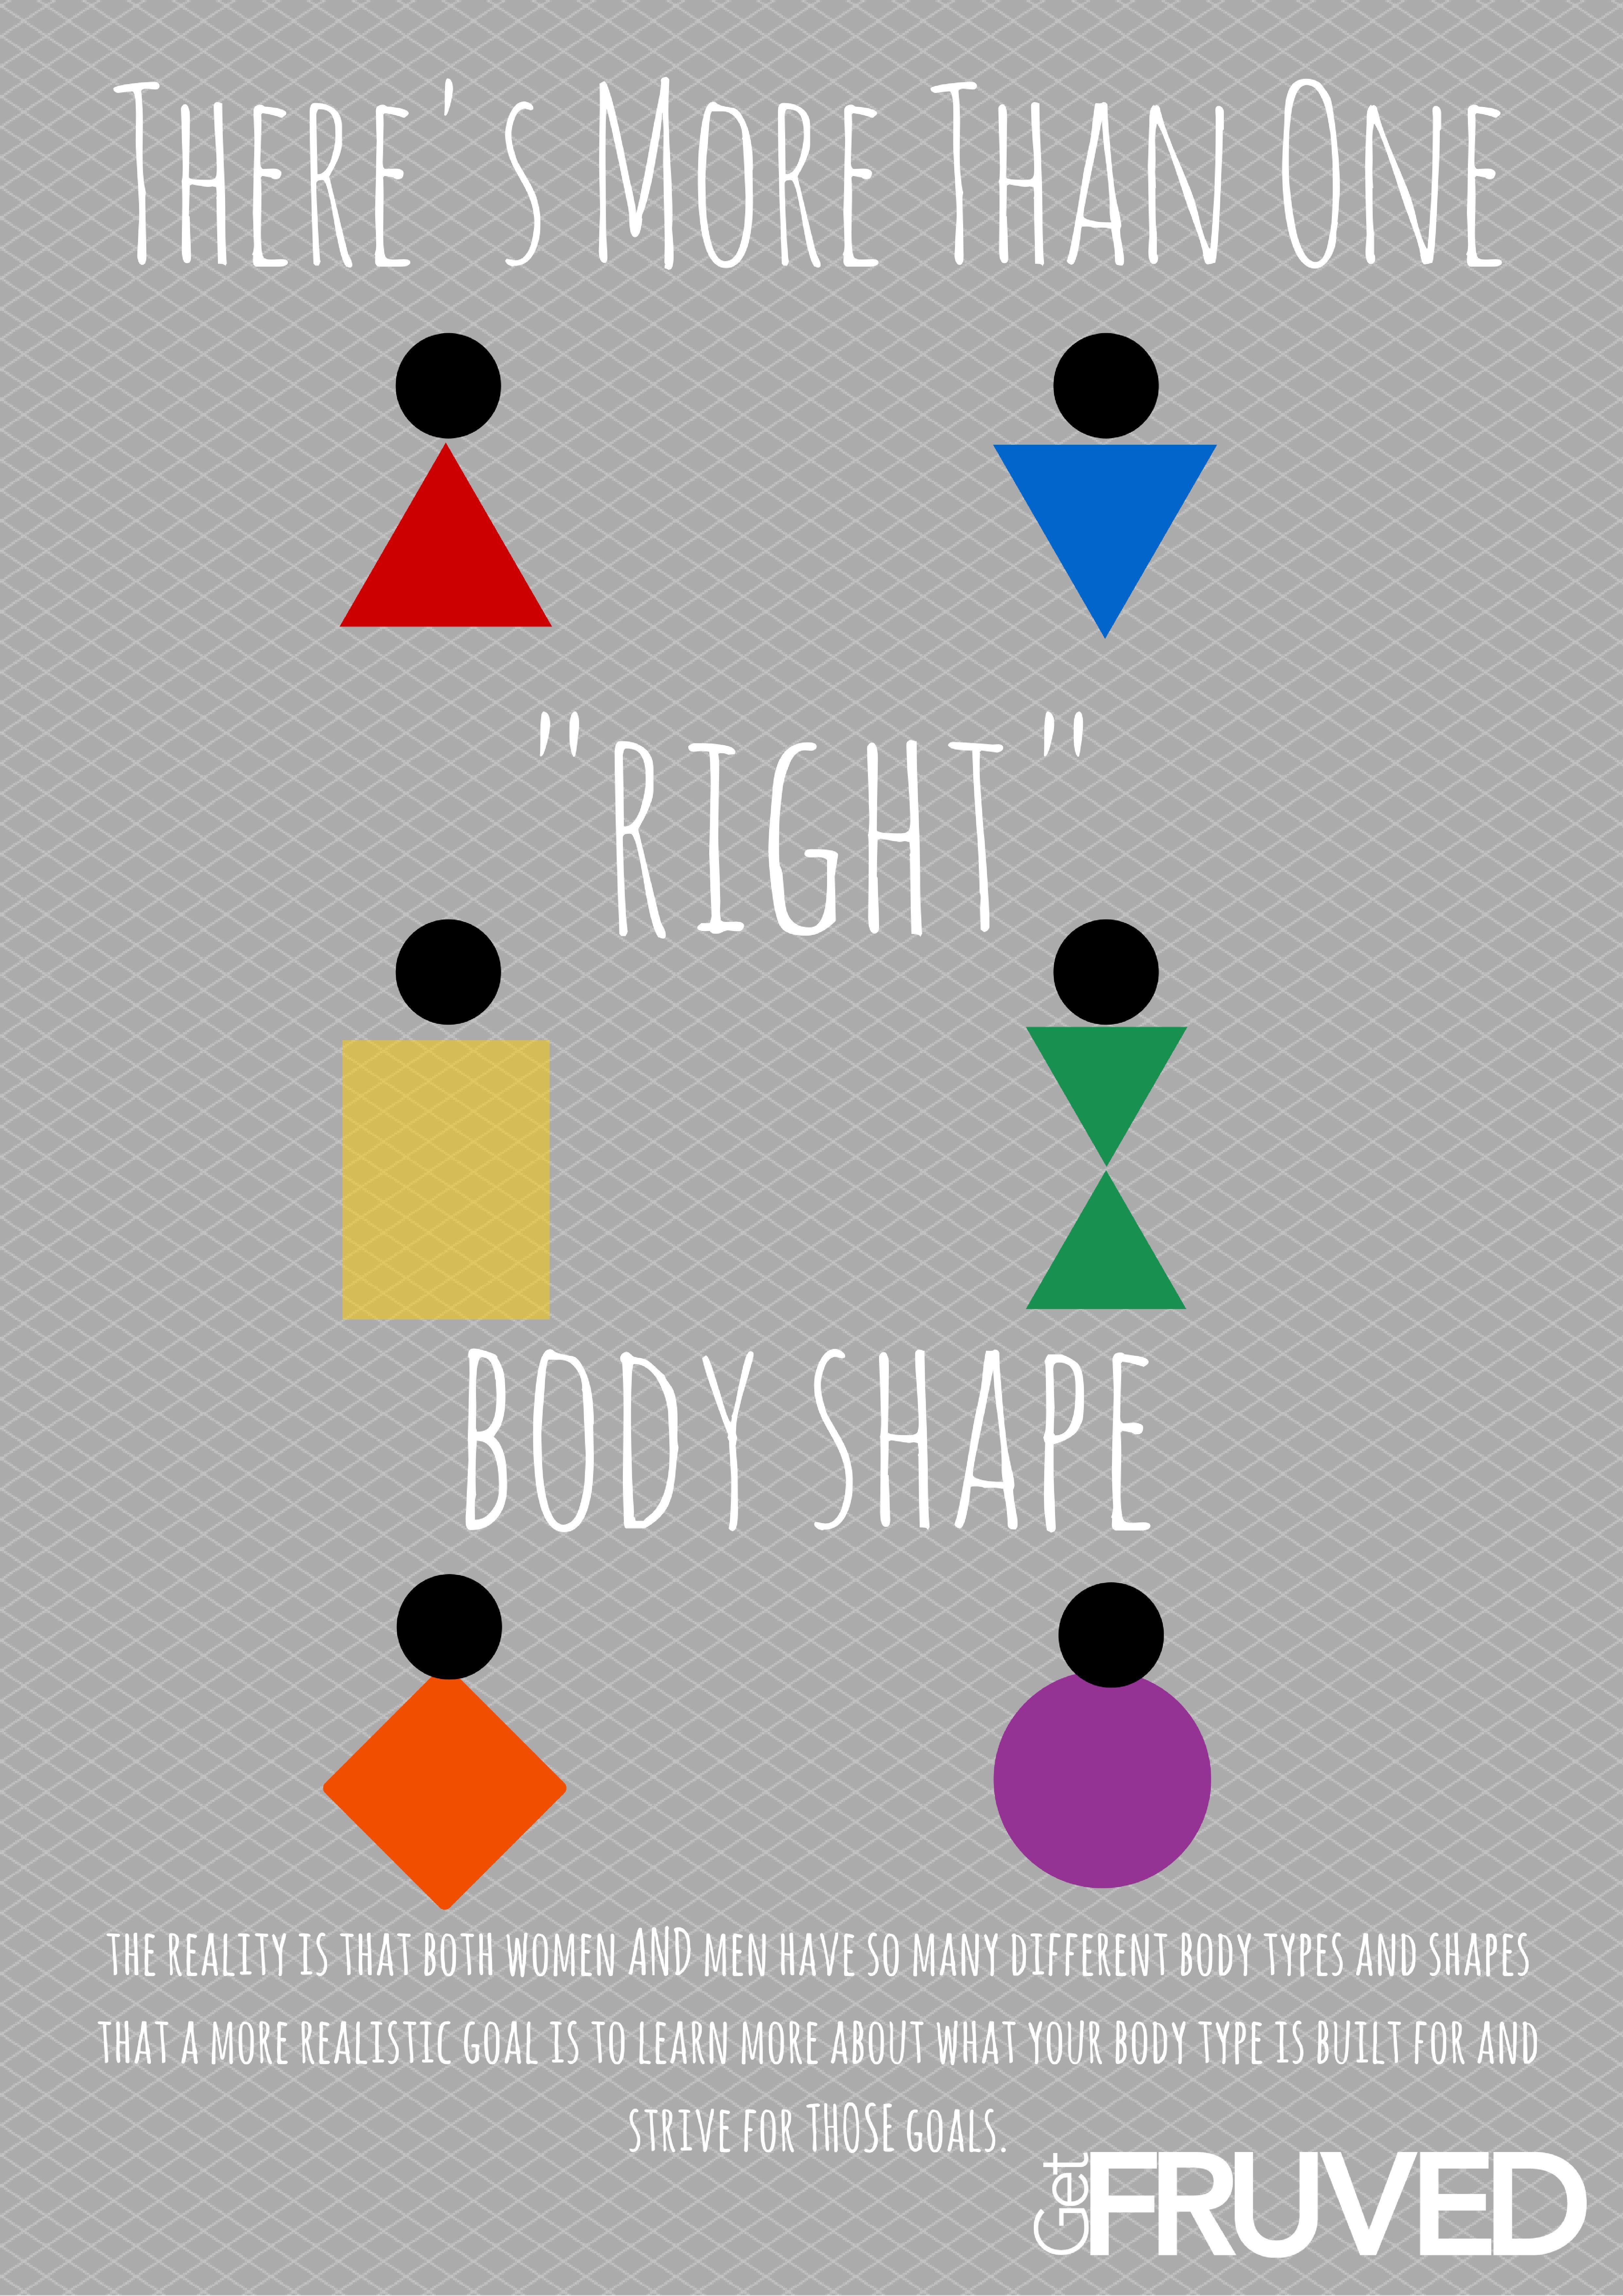 Body Image - Cybersmile